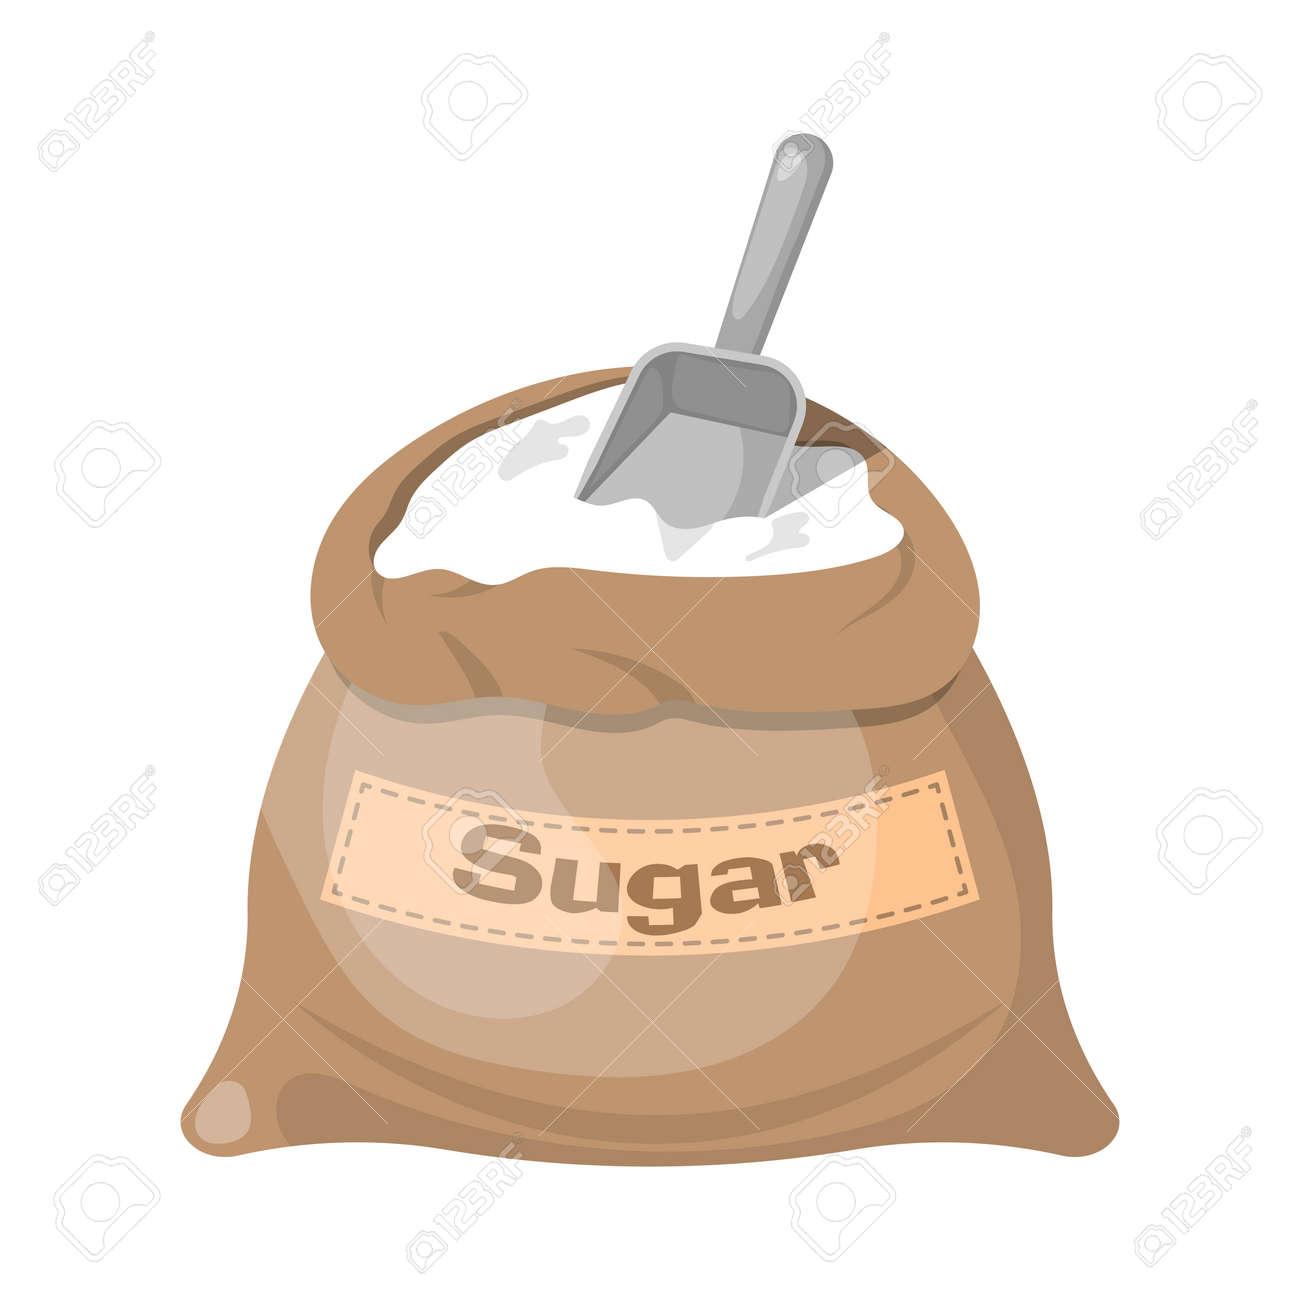 Sugar bag icon, Sugar bag icon eps 10, Sugar bag icon vector, Sugar bag icon jpg. Vector illustration - 58343122